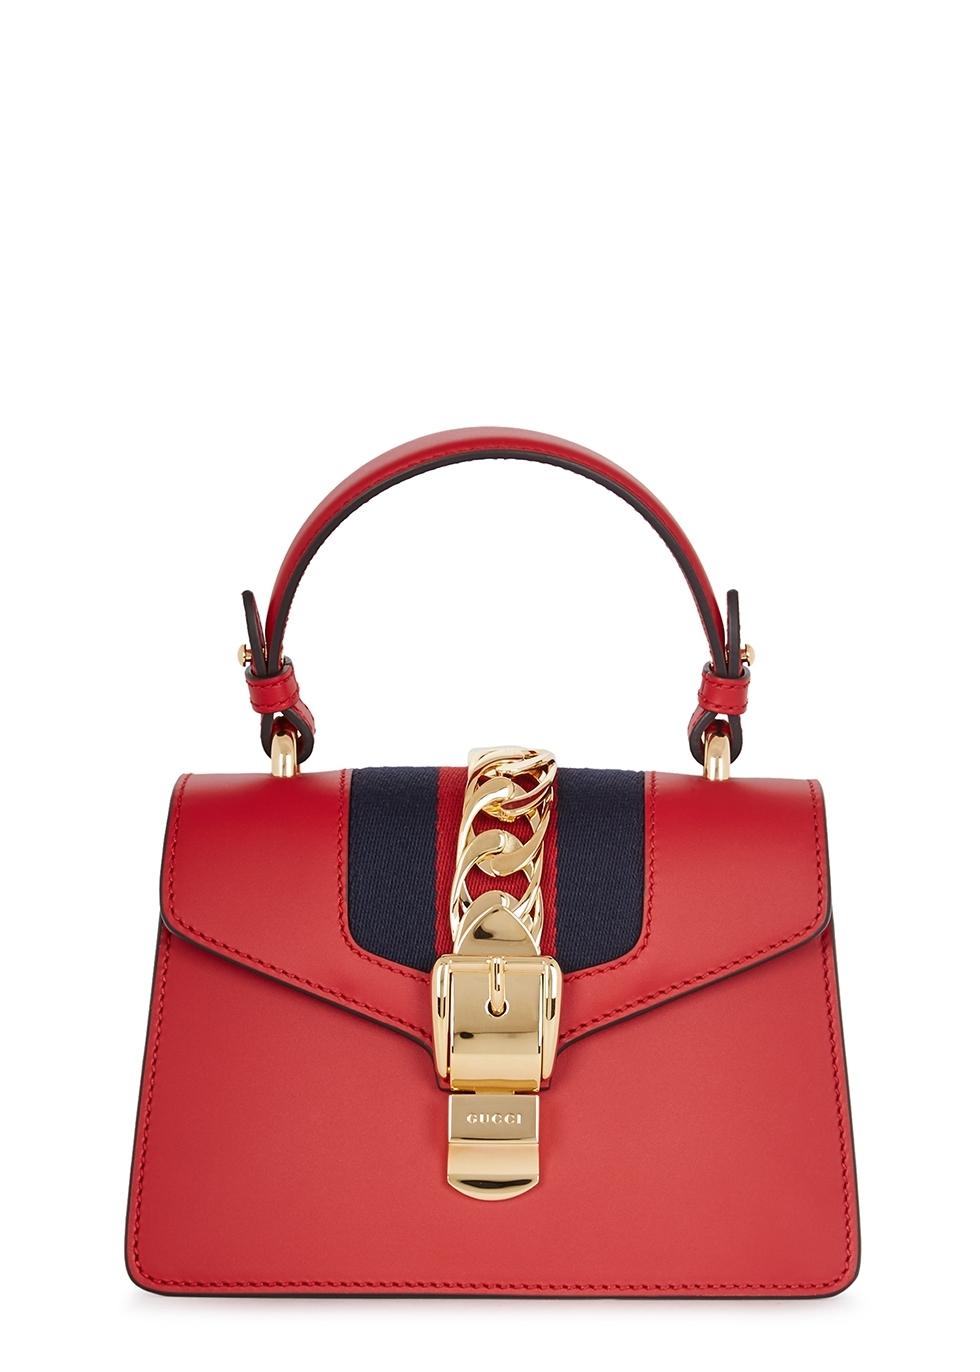 9f178ad45b32 Gucci Bags - Womens - Harvey Nichols